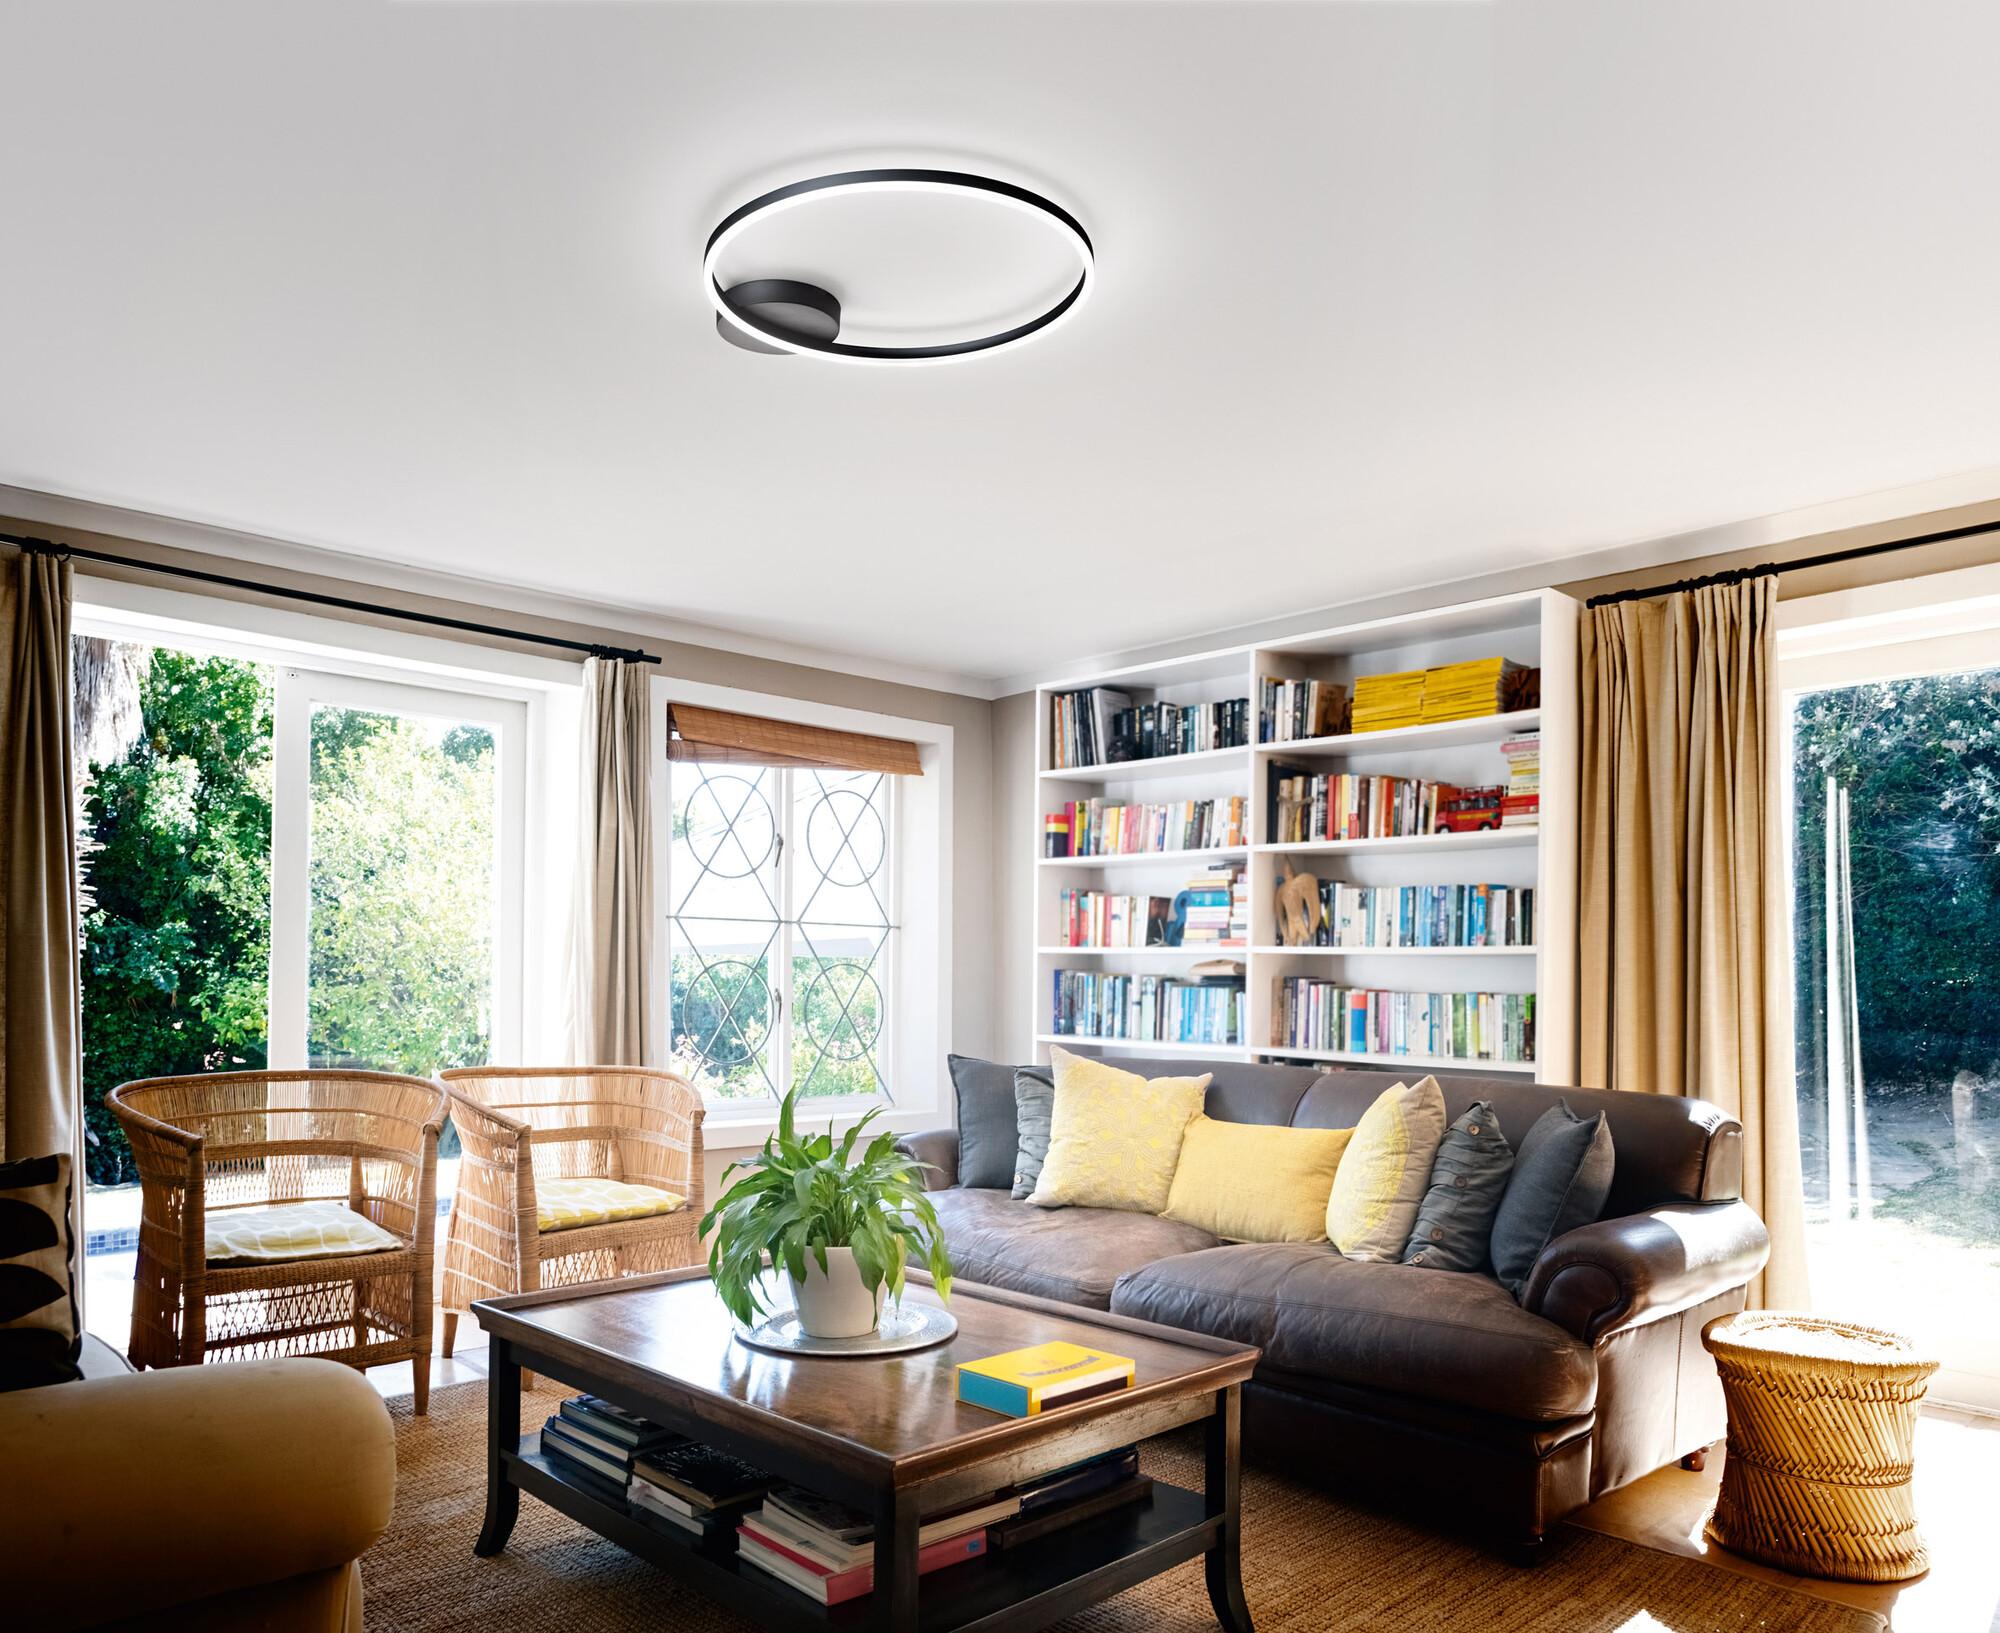 GIOTTO Plafondlamp LED 1x36W/3240lm Rond Zwart